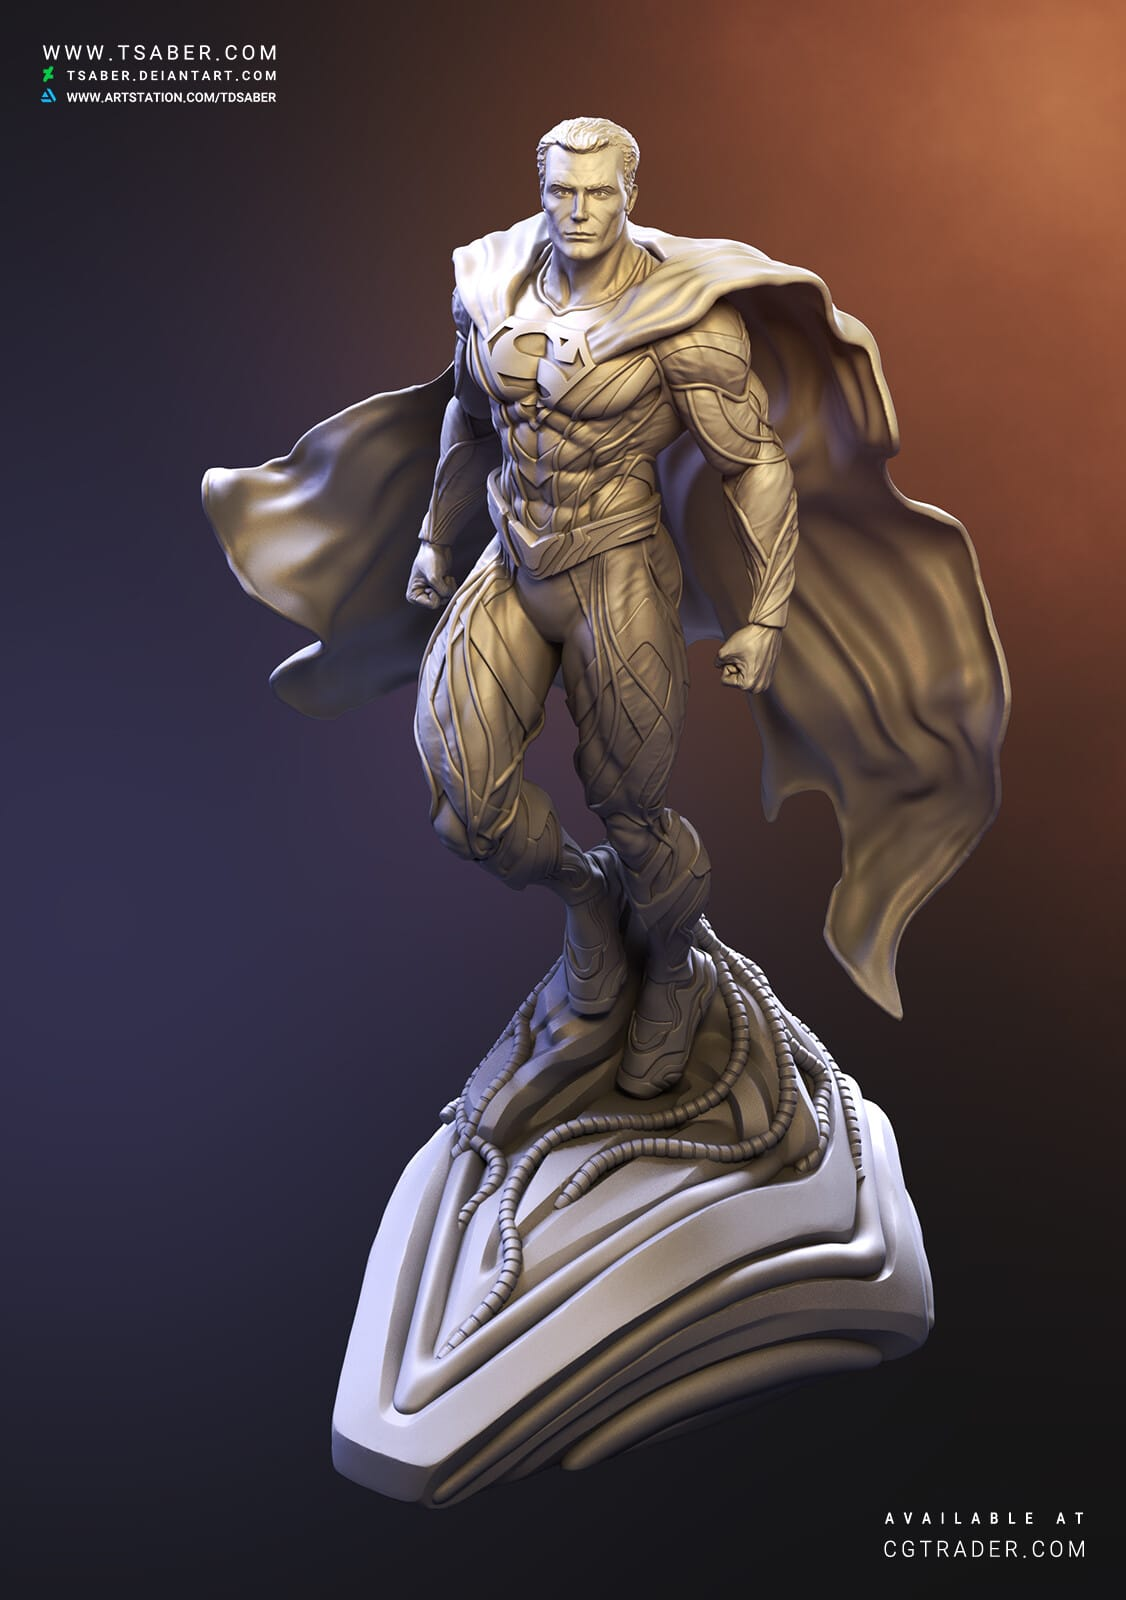 Superman Zbrush sculpture - DC Collectibles - Tsaber